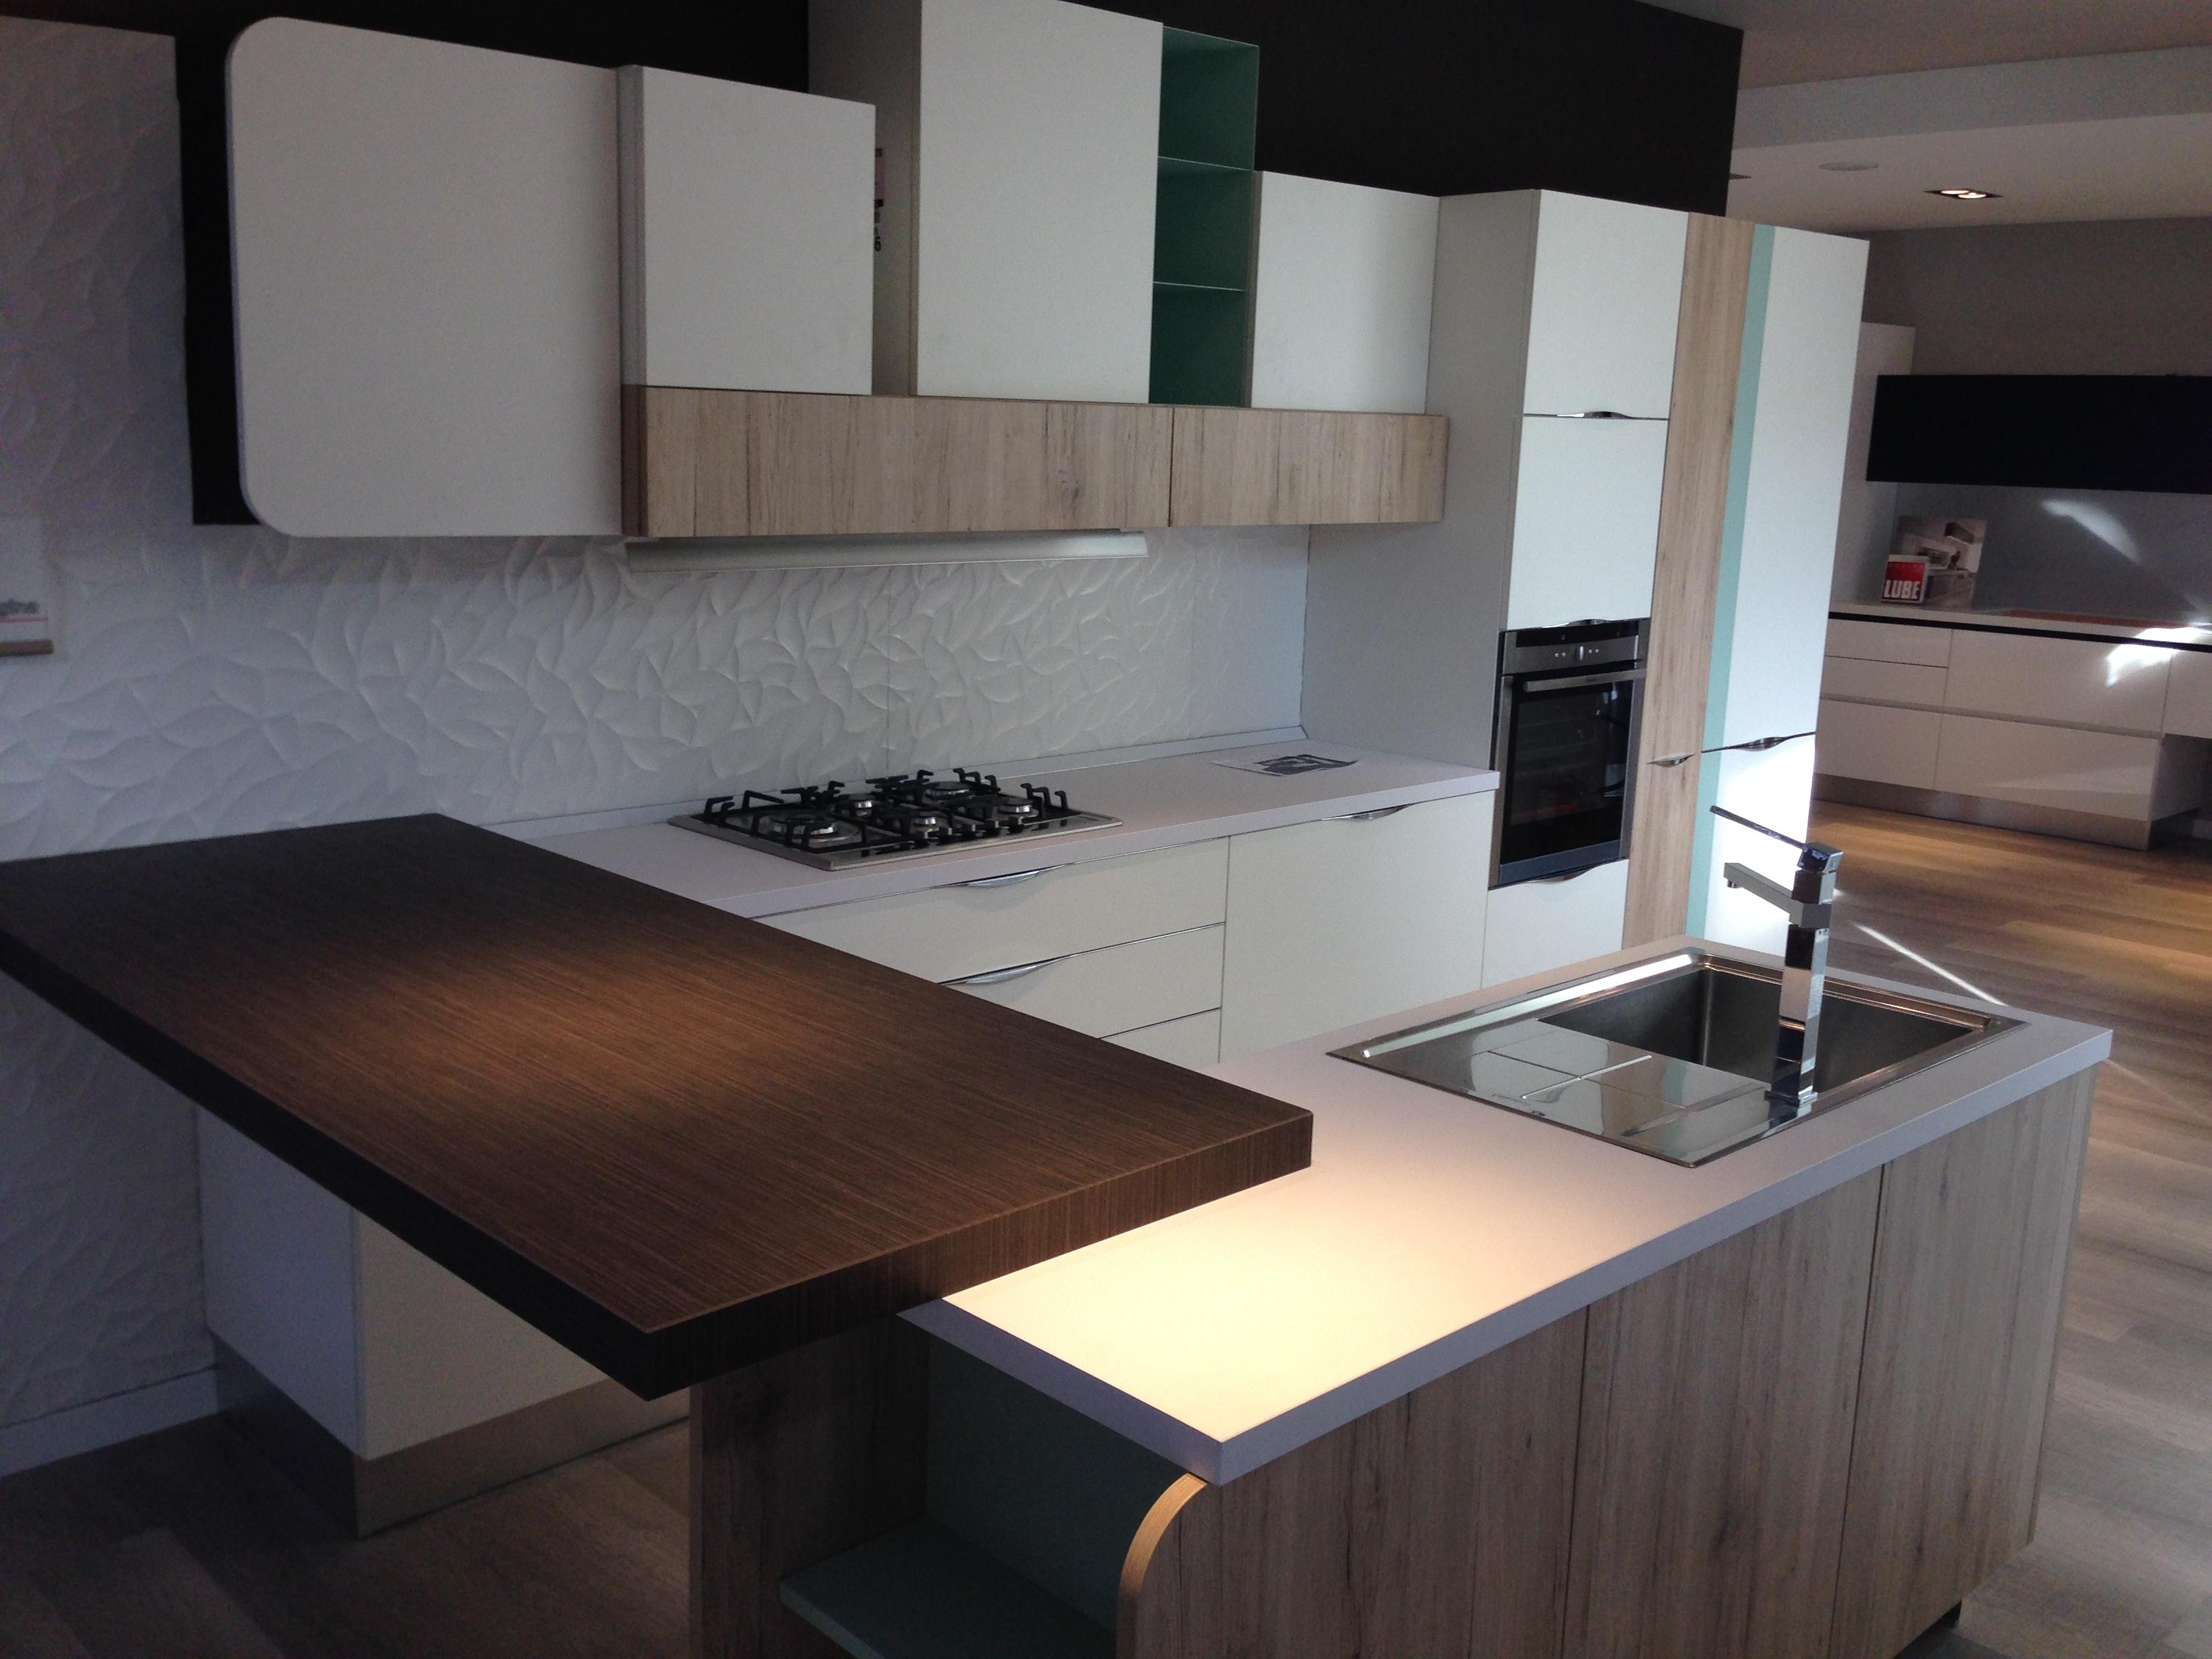 Cucina Immagina – Offerta EXPO - Cucine Lube Roma - DFG Arredamenti